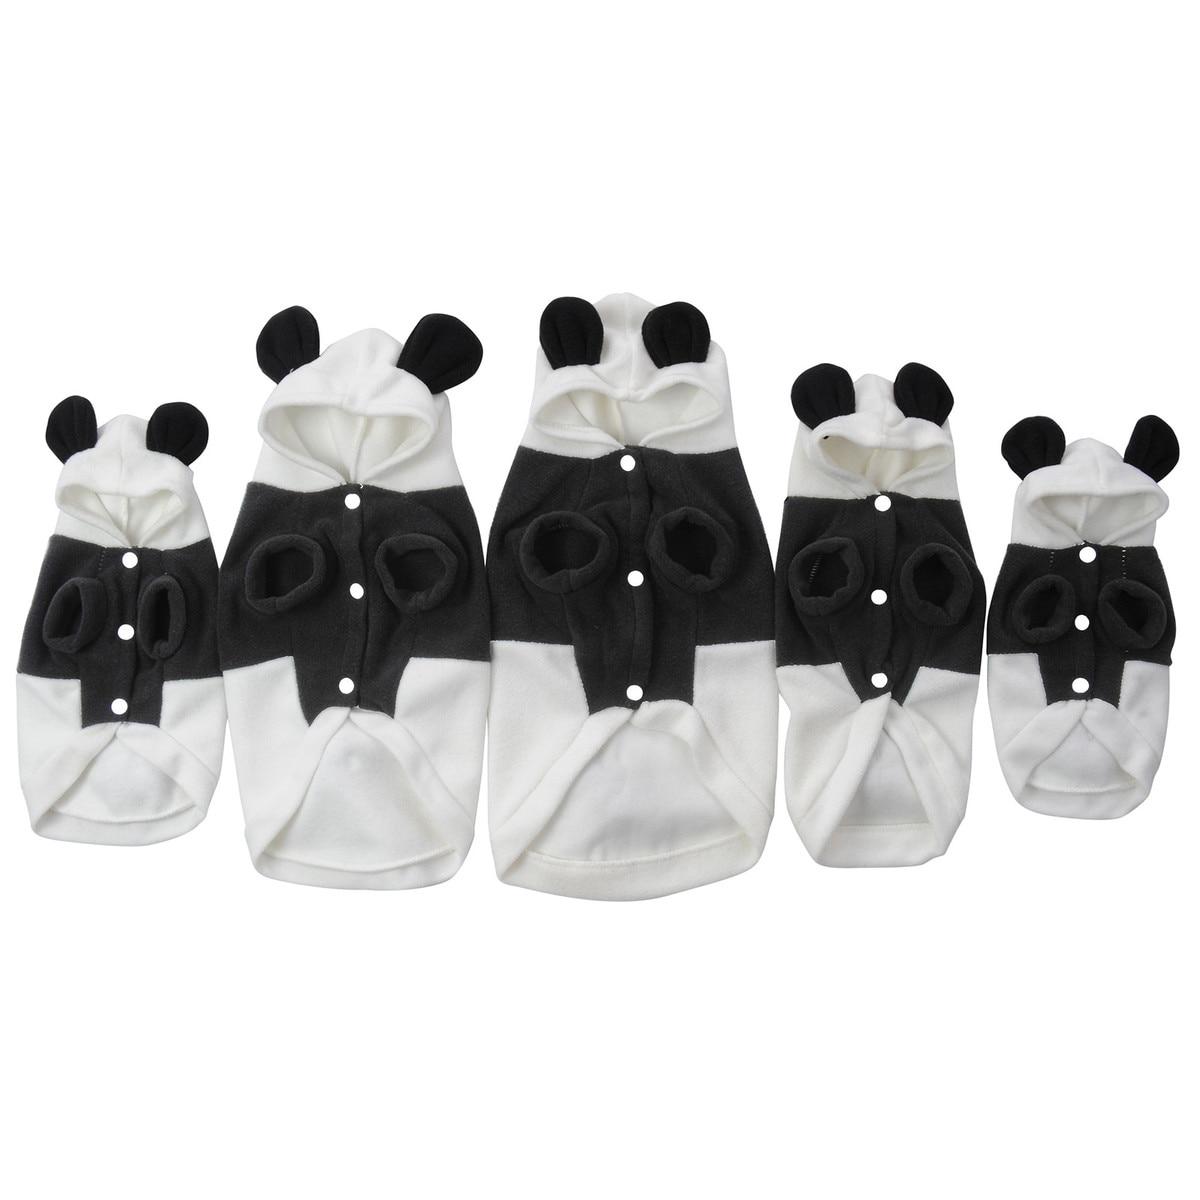 Panda Suit Hoodie Costume Pet Dog Clothes Cute Fleece Clothes Soft Warm Coat Jacket Cospla